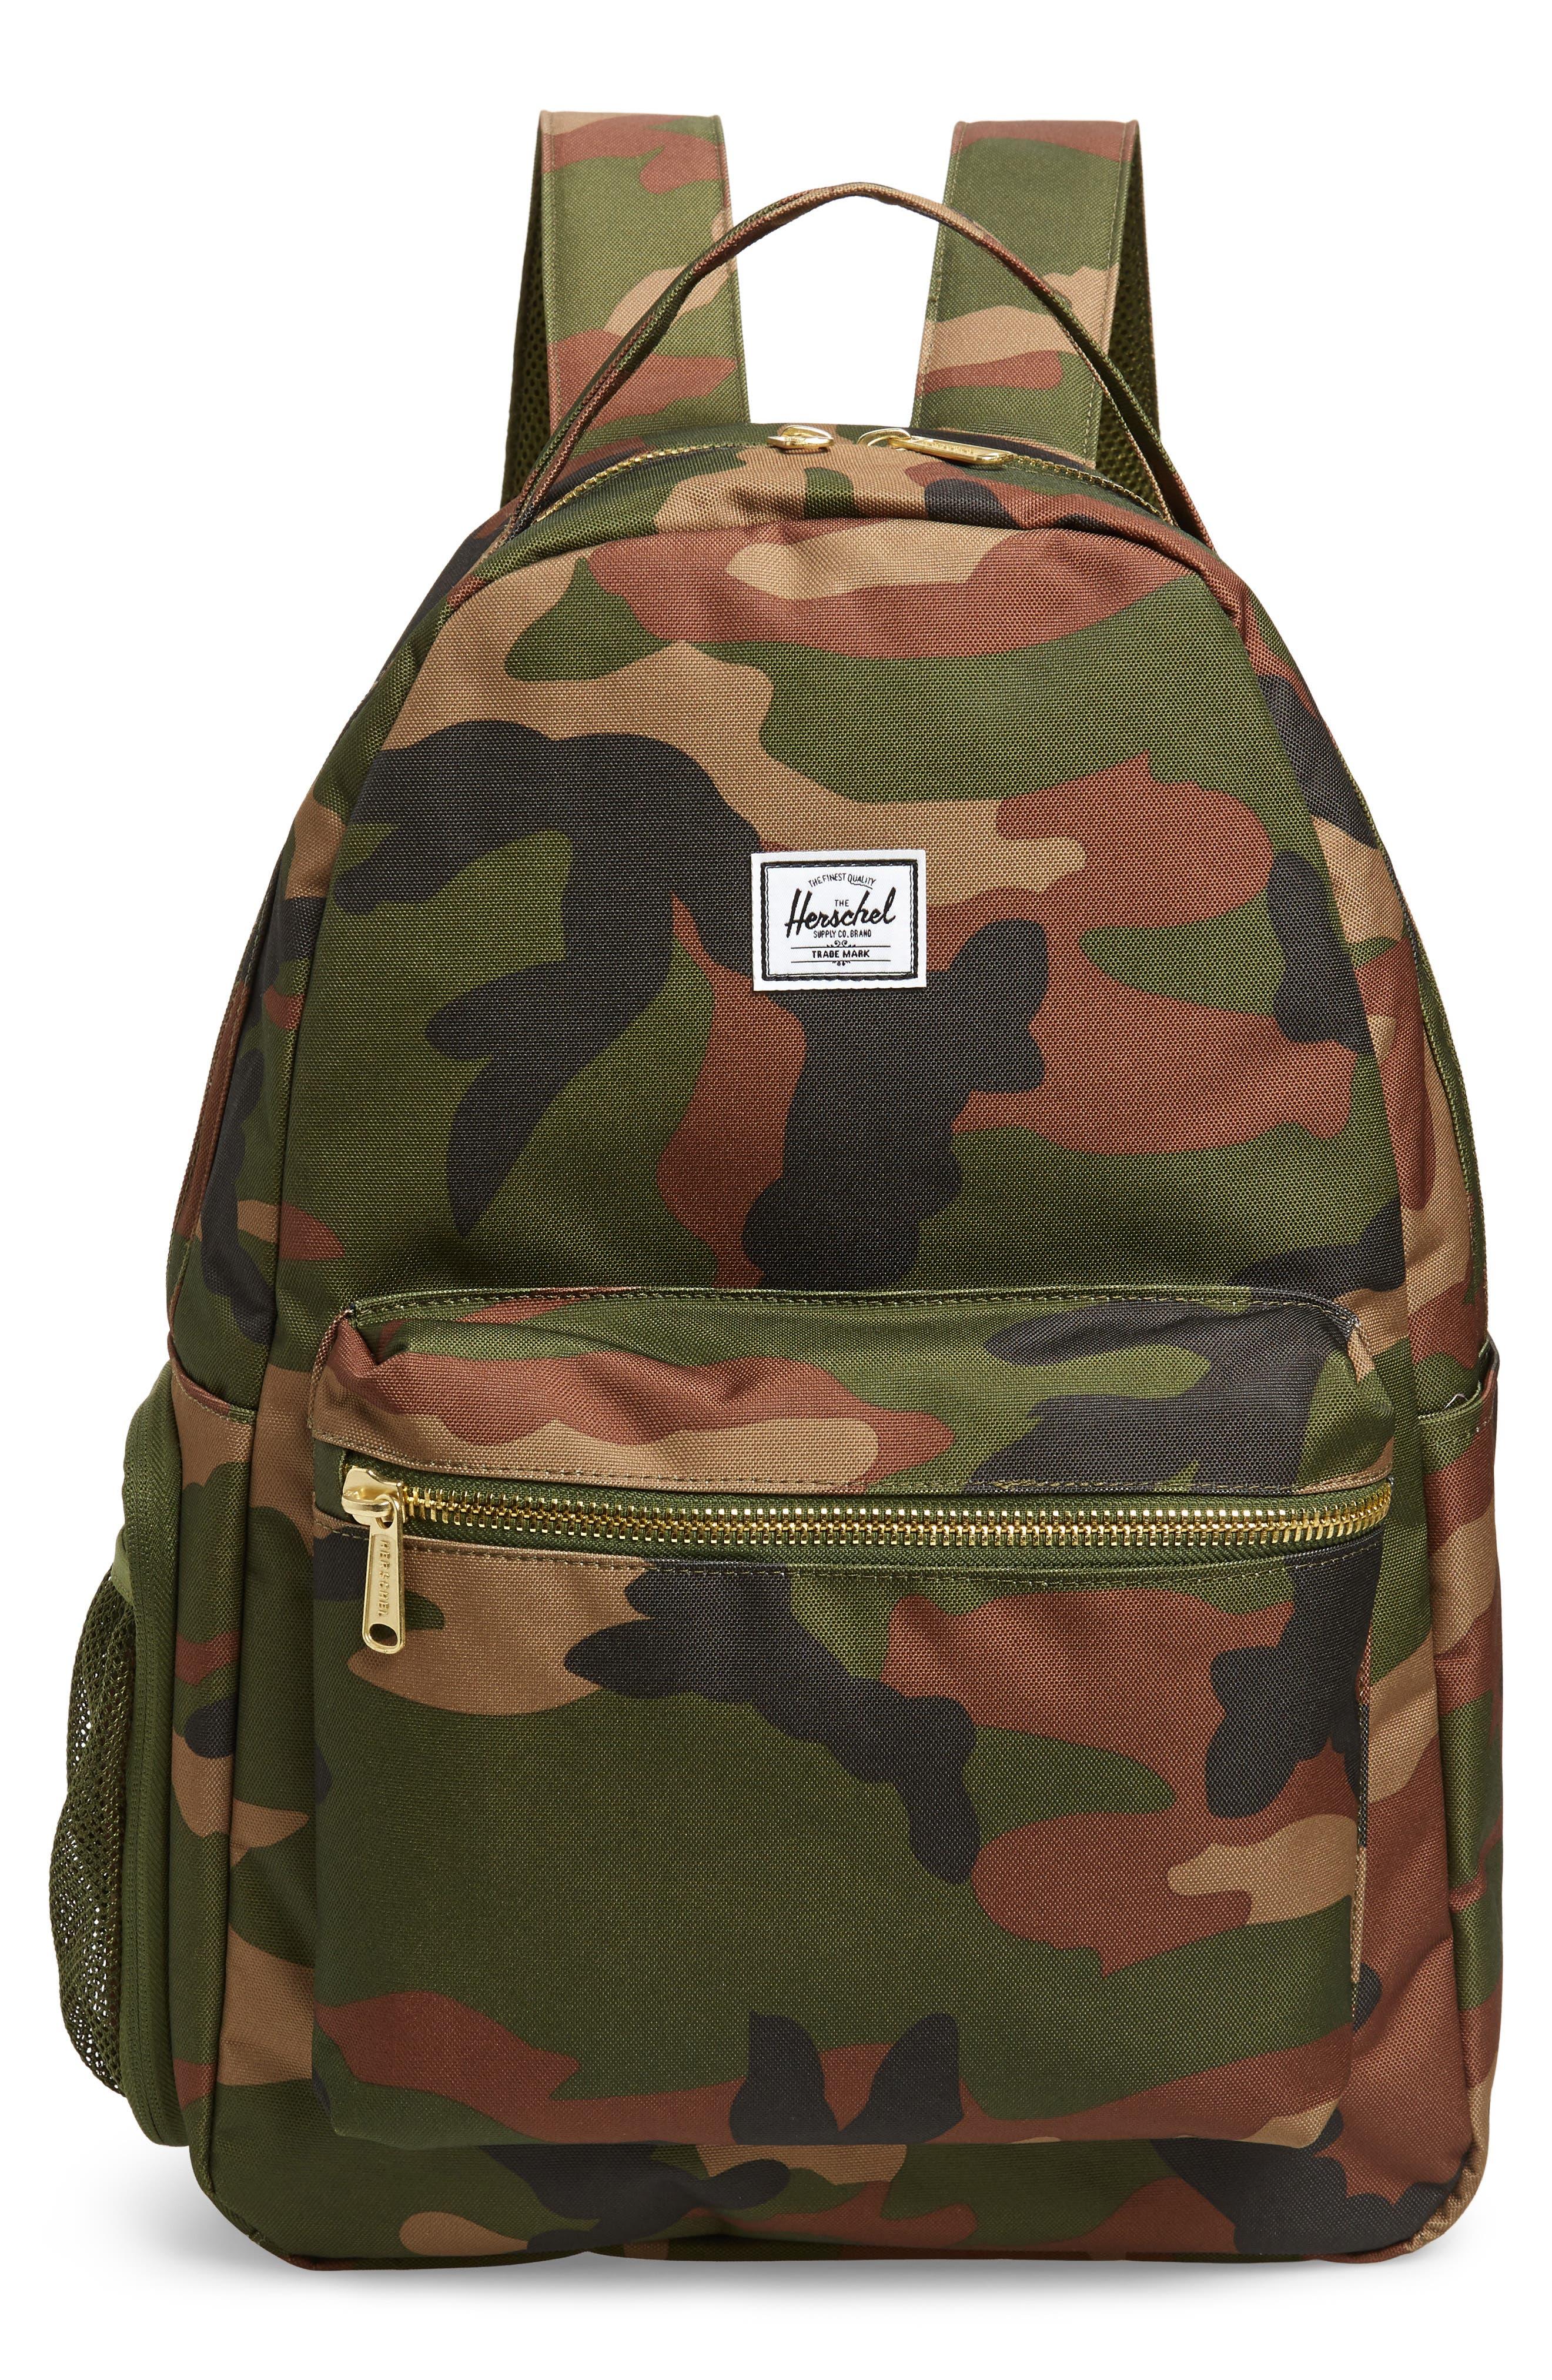 Infant Herschel Supply Co Nova Sprout Diaper Backpack  Green